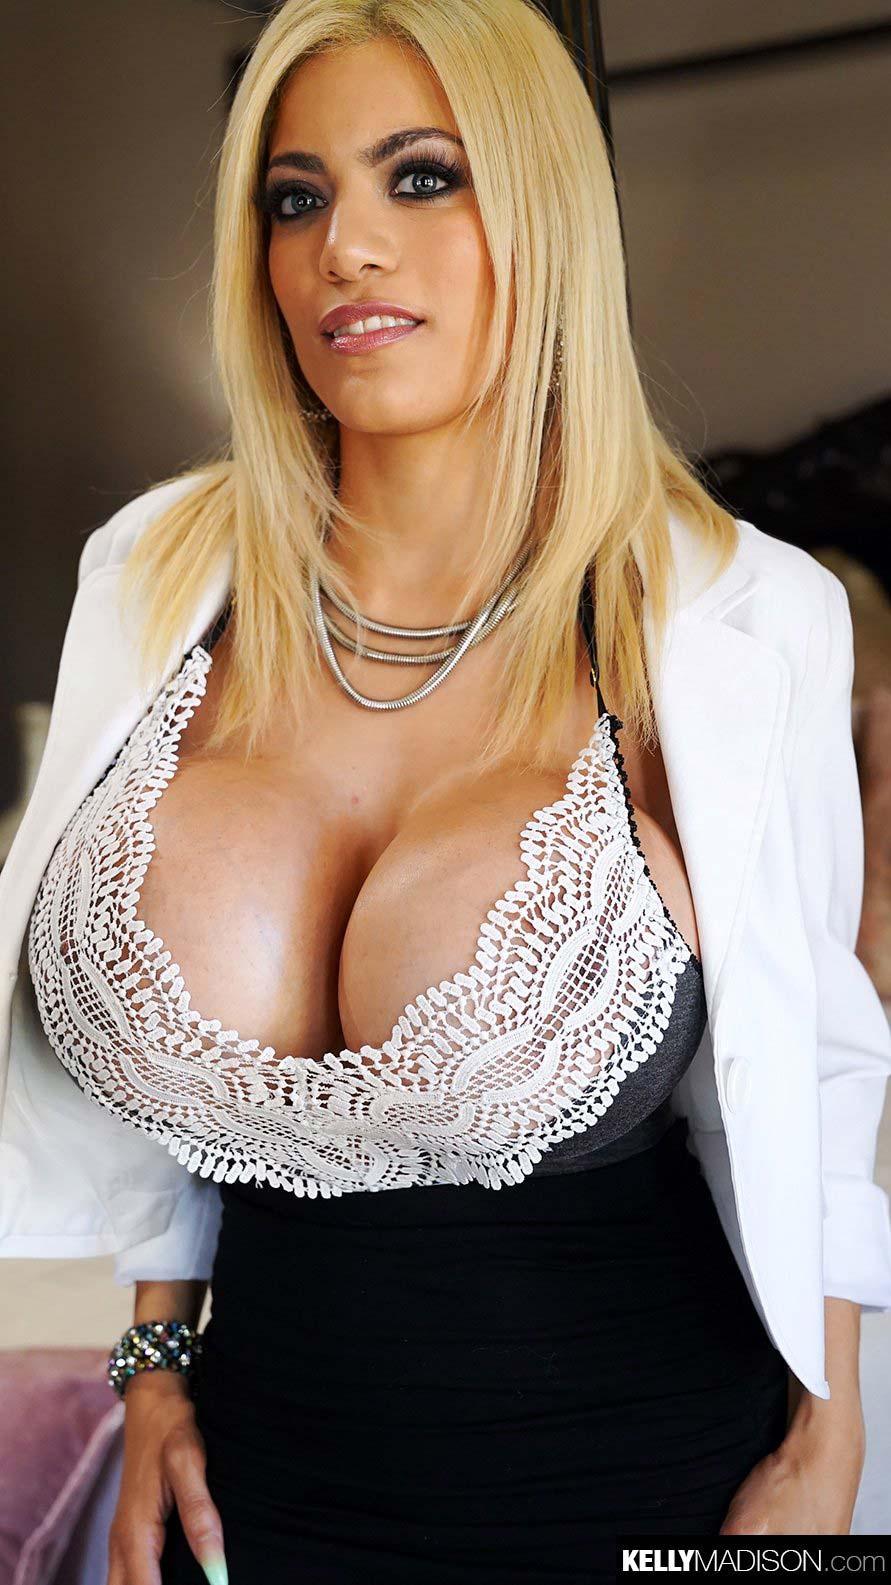 Fucked Up Tits amber alena huge tits fuckedryan – the boobs blog